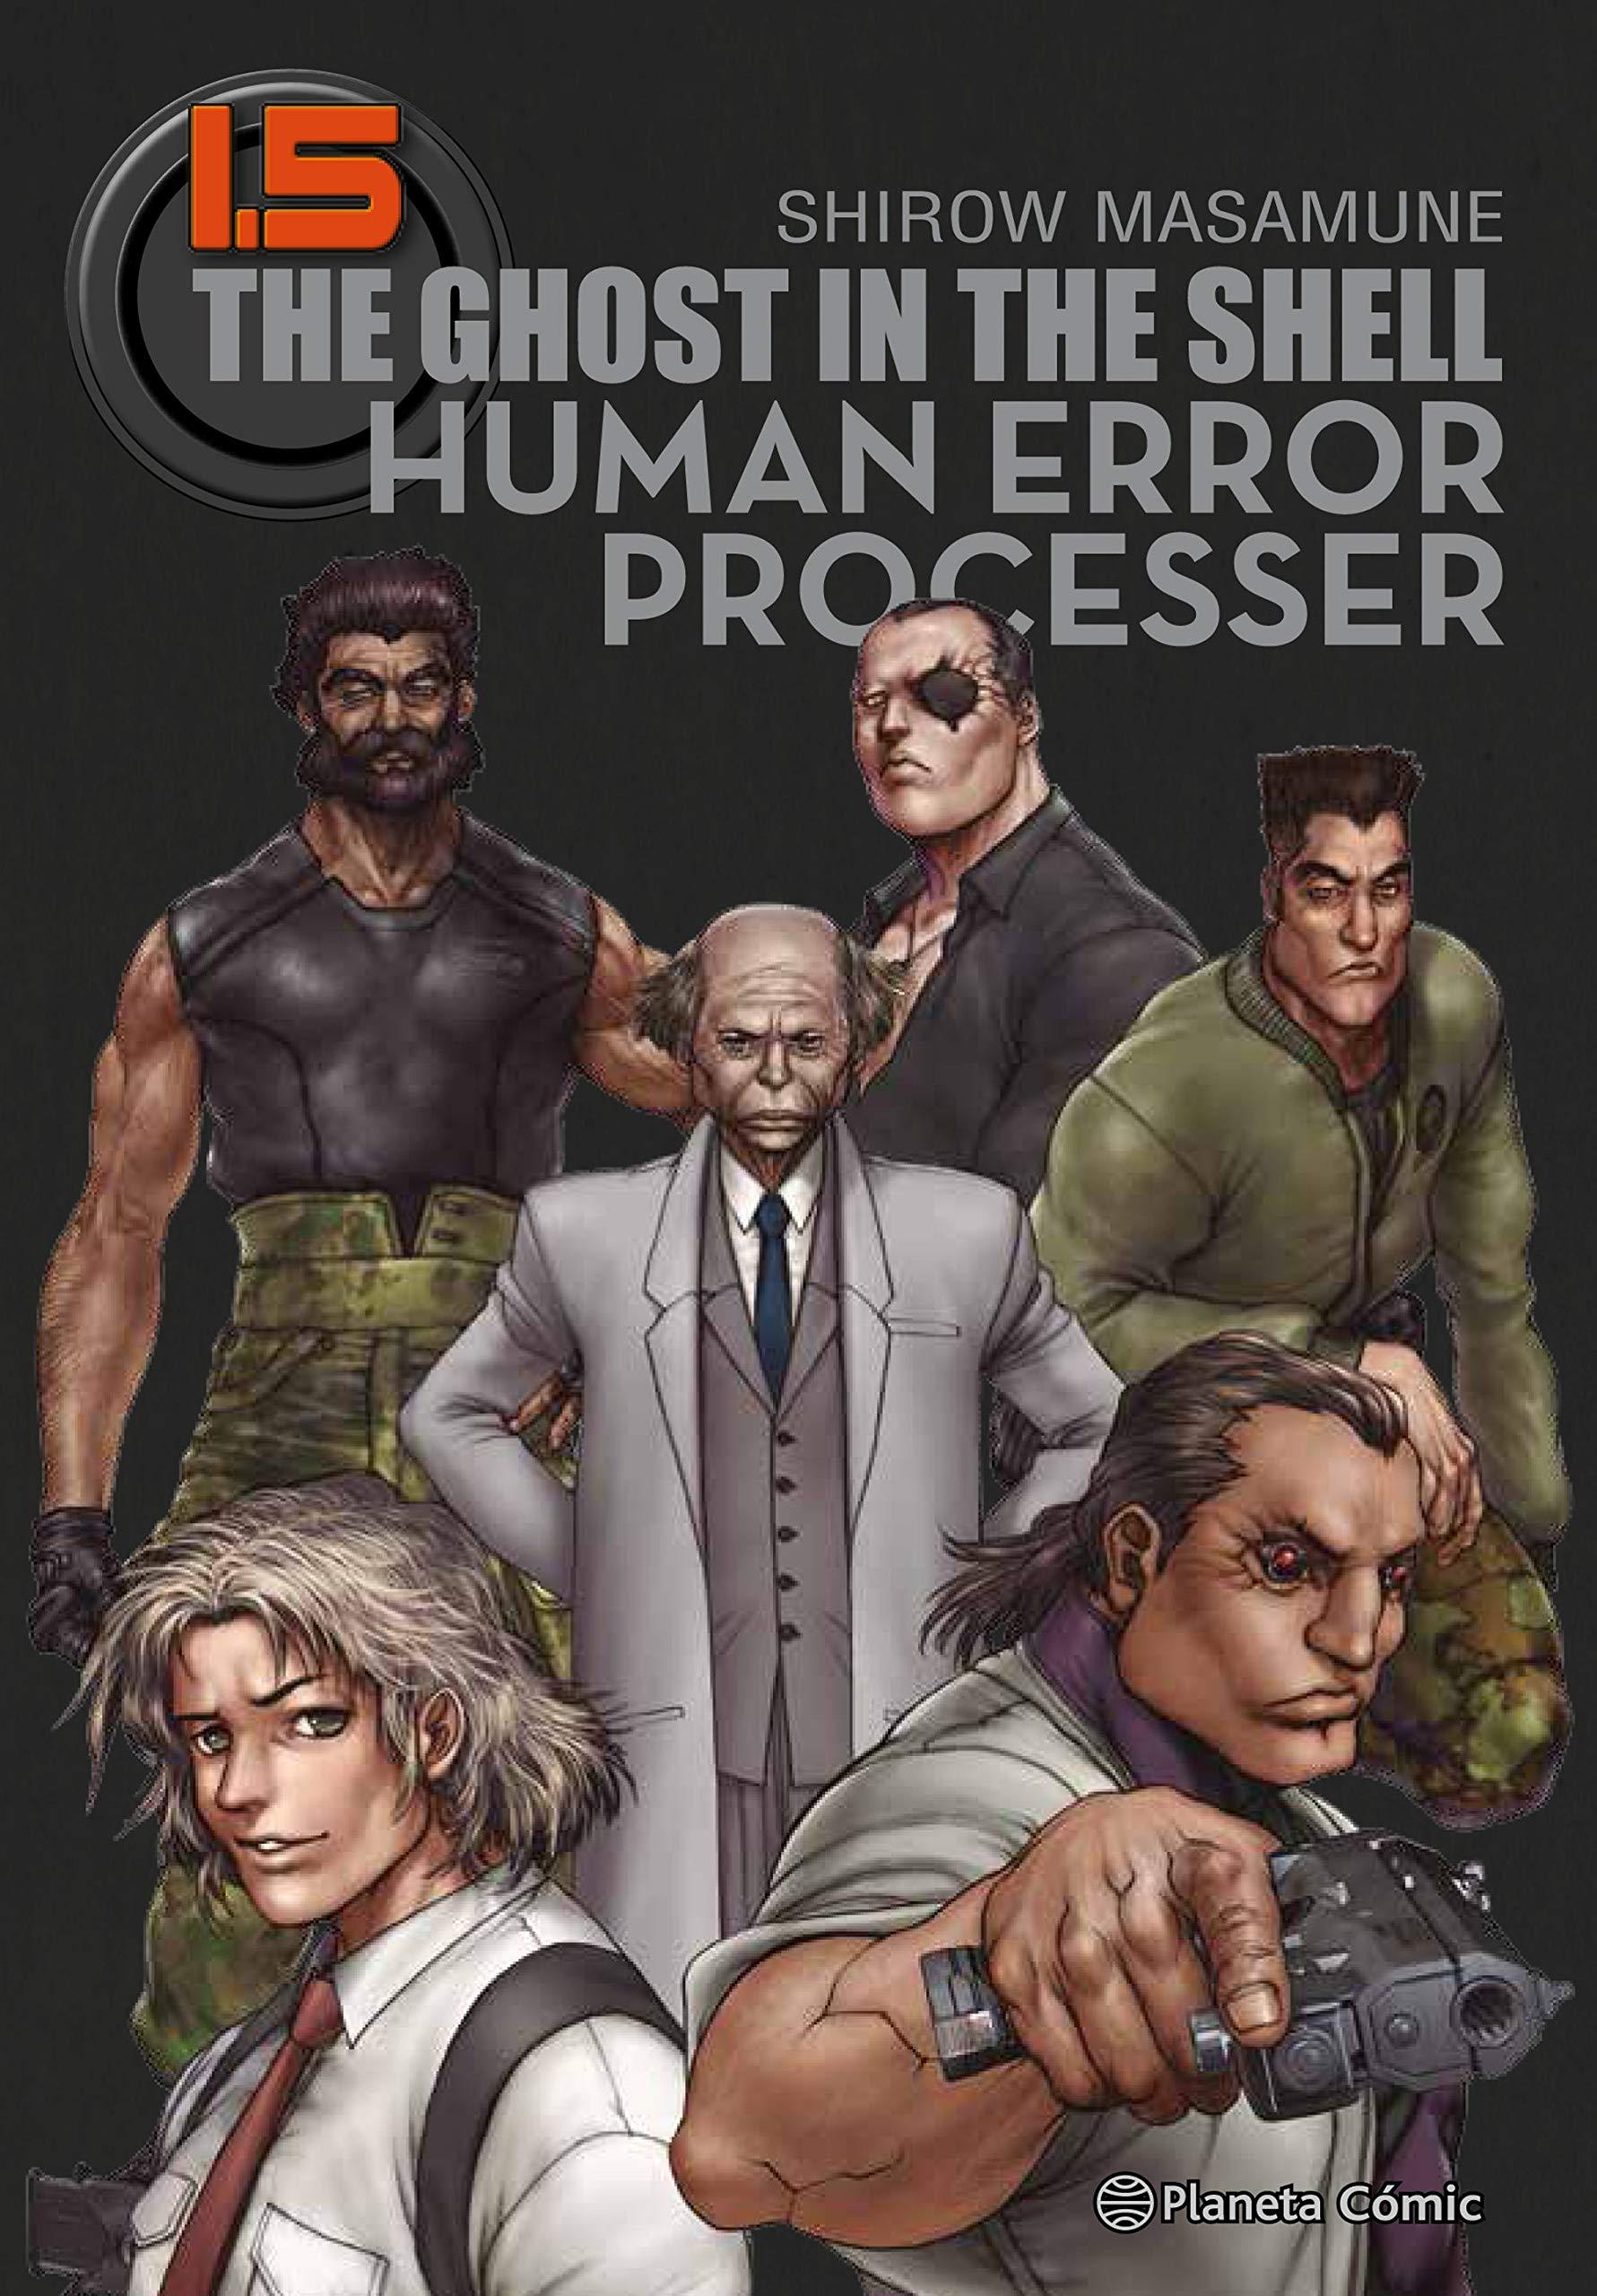 Ghost in the Shell 1.5 Trazado : Human Error Processer Manga Seinen: Amazon.es: Masamune, Shirow, Daruma: Libros